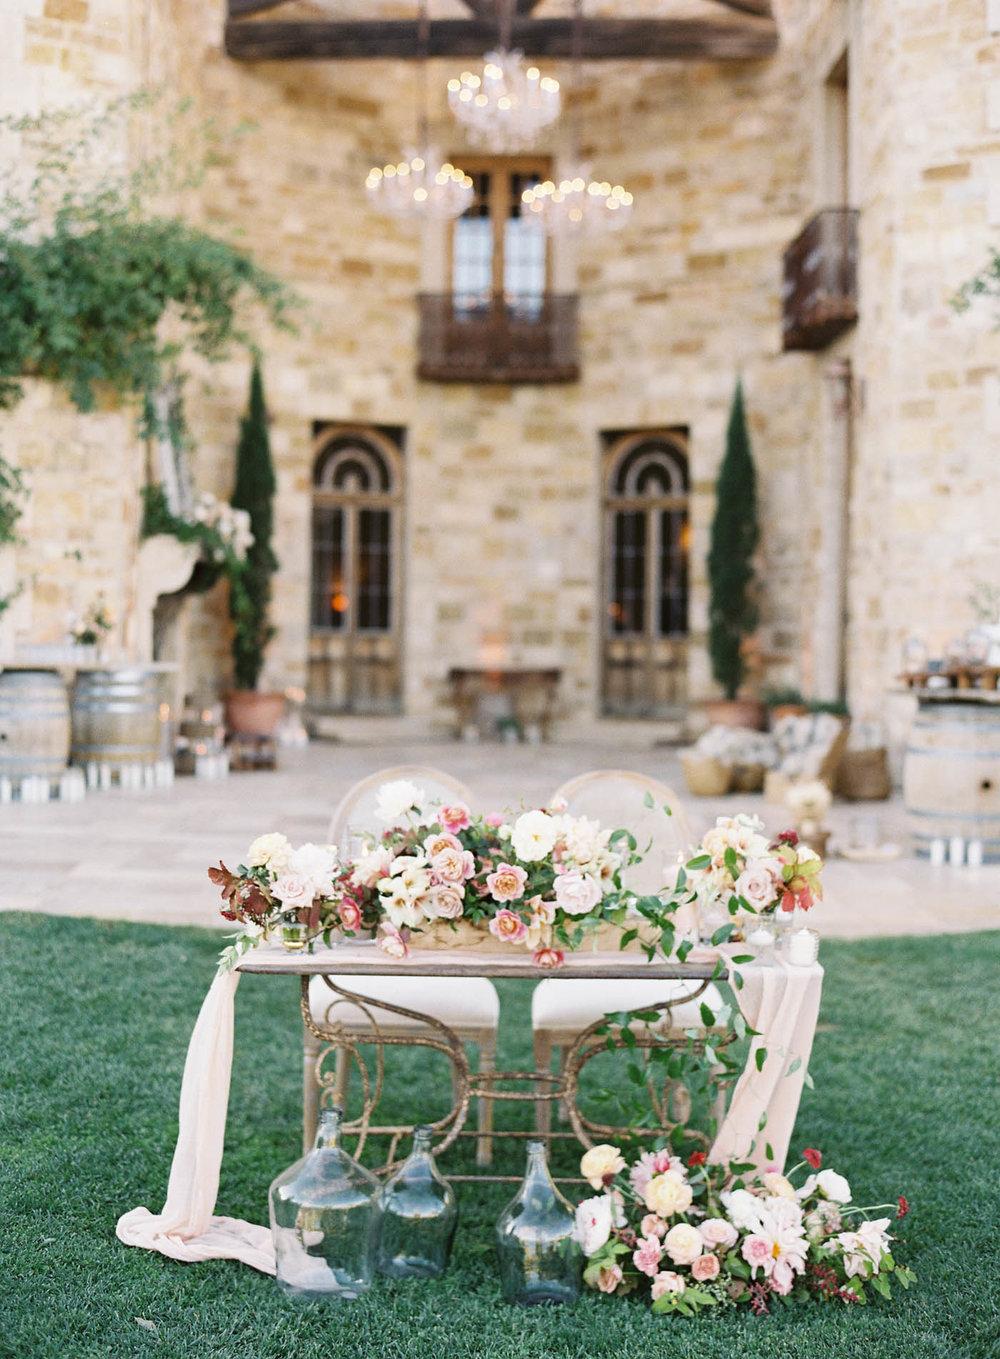 sunstone-villa-wedding-30-Jen_Huang-RD-150-Jen_Huang-009582-R1-015.jpg